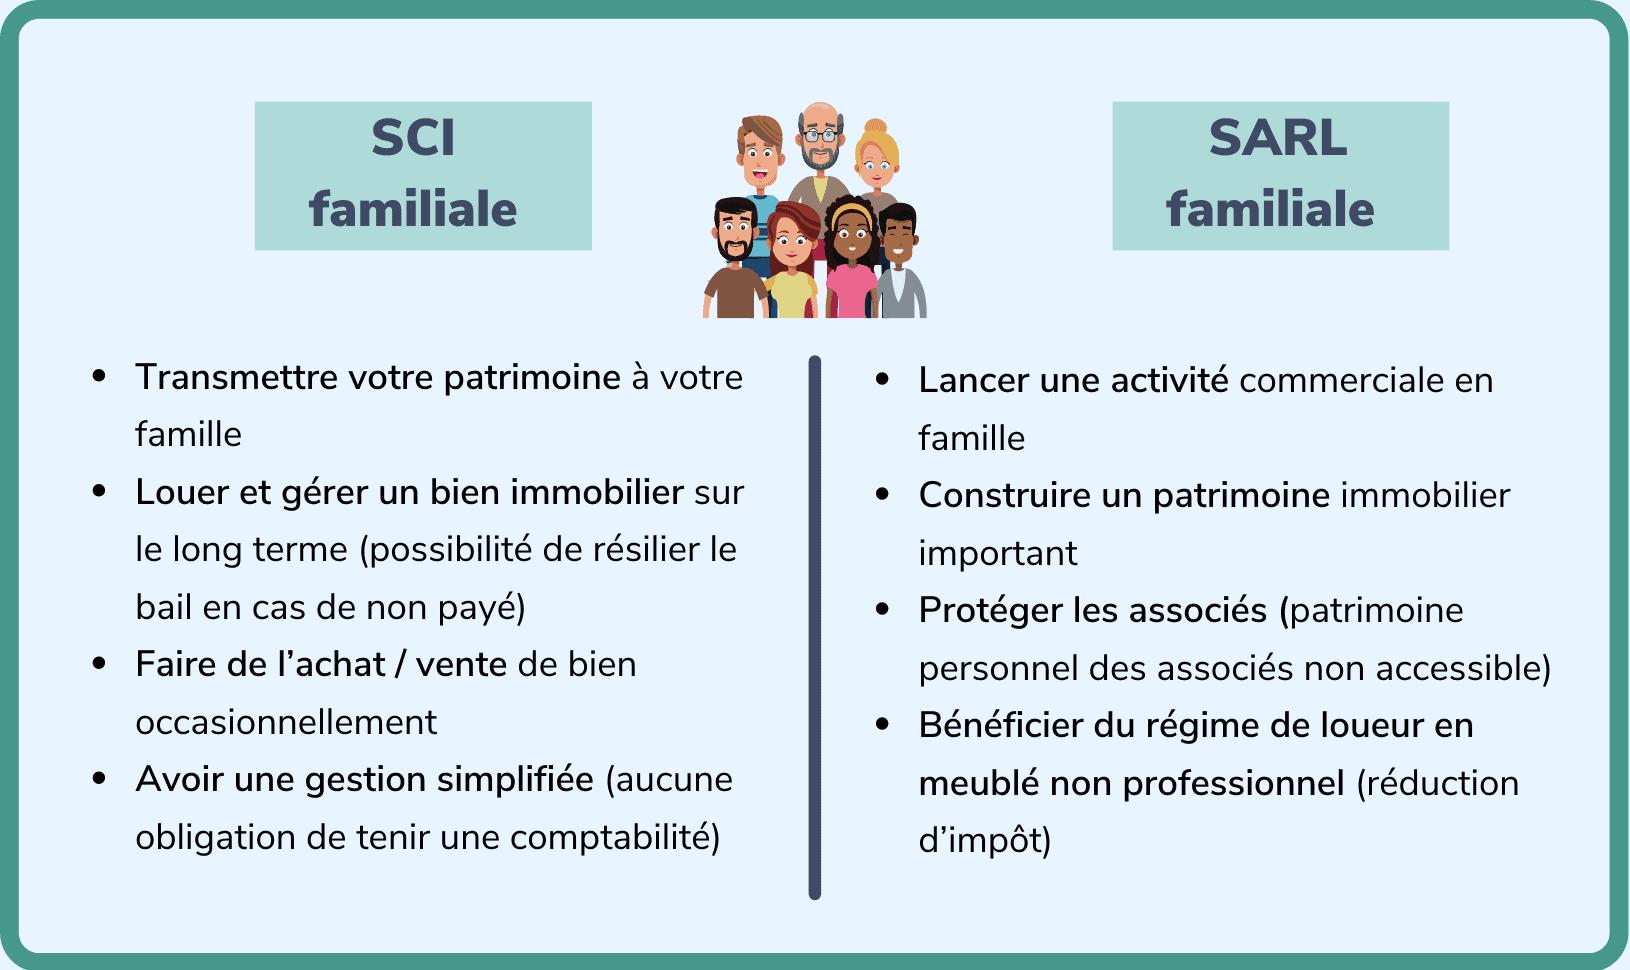 SARL familiale ou SCI